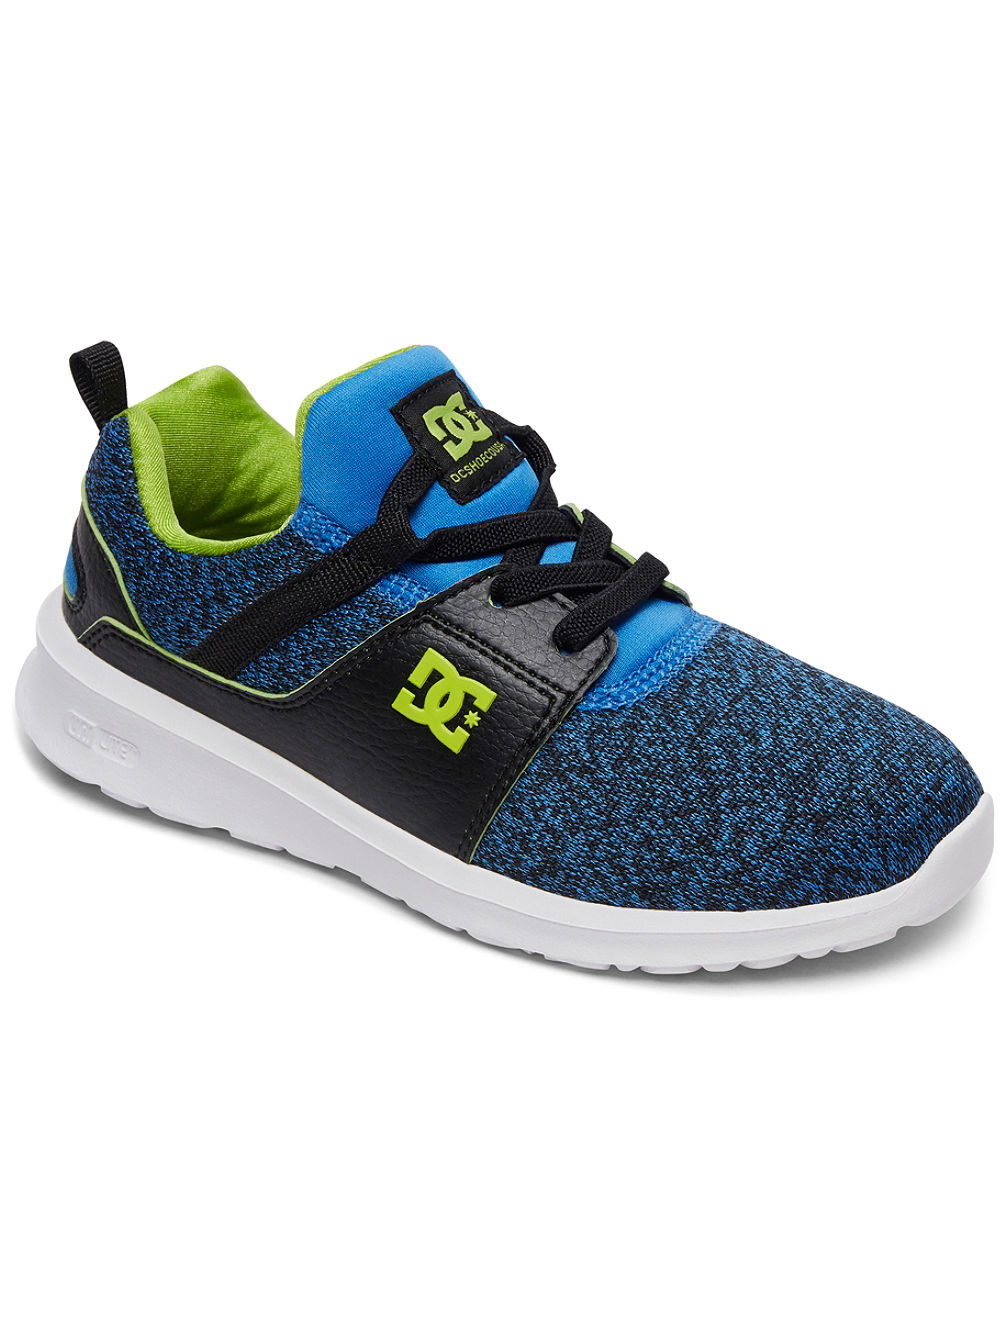 b92e1359c46fc0 Buy DC Heathrow TX SE Sneakers Boys online at blue-tomato.com